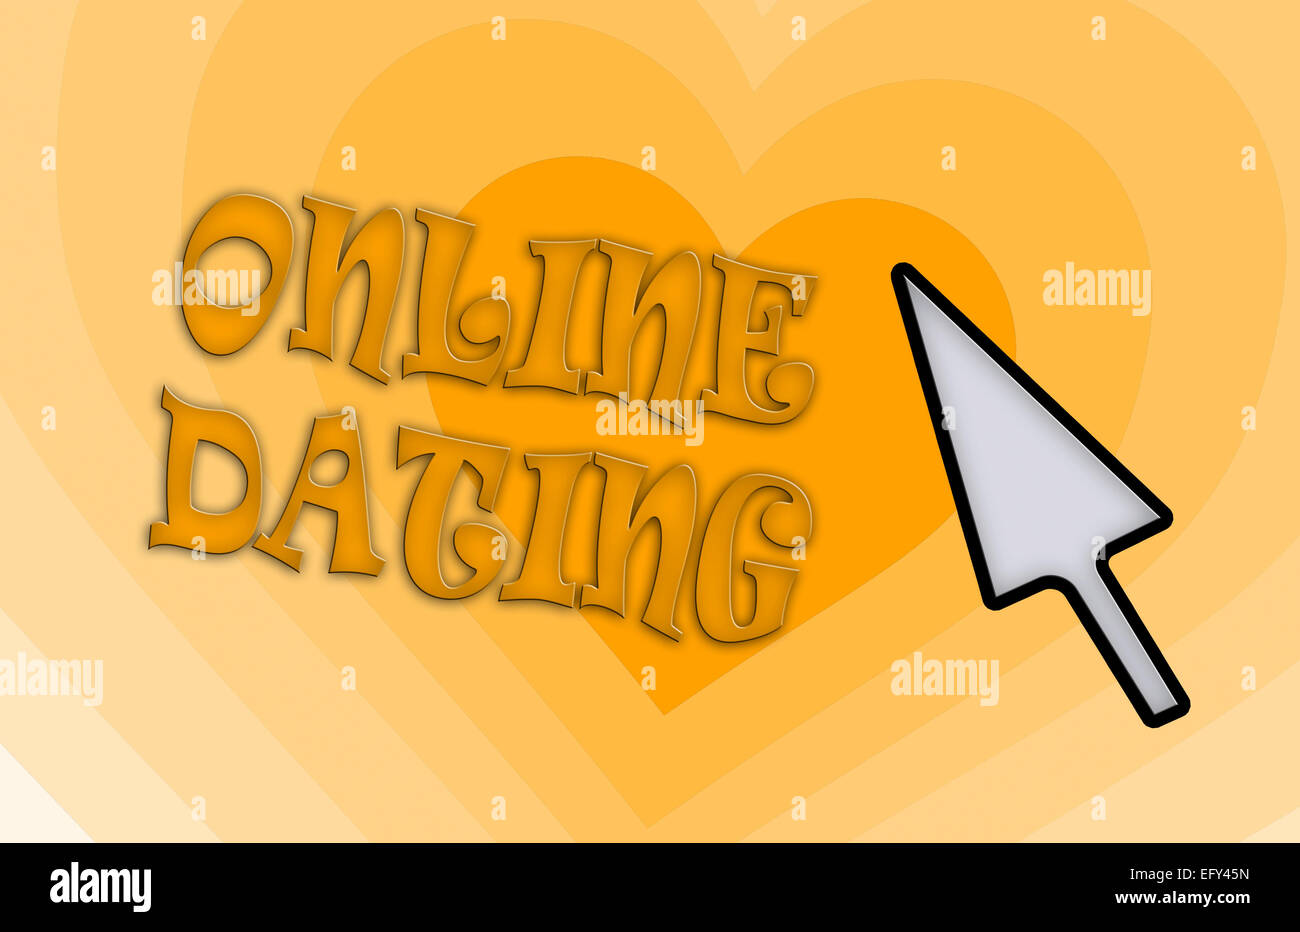 Heart shape backgound - Concept of dating - orange - Stock Image